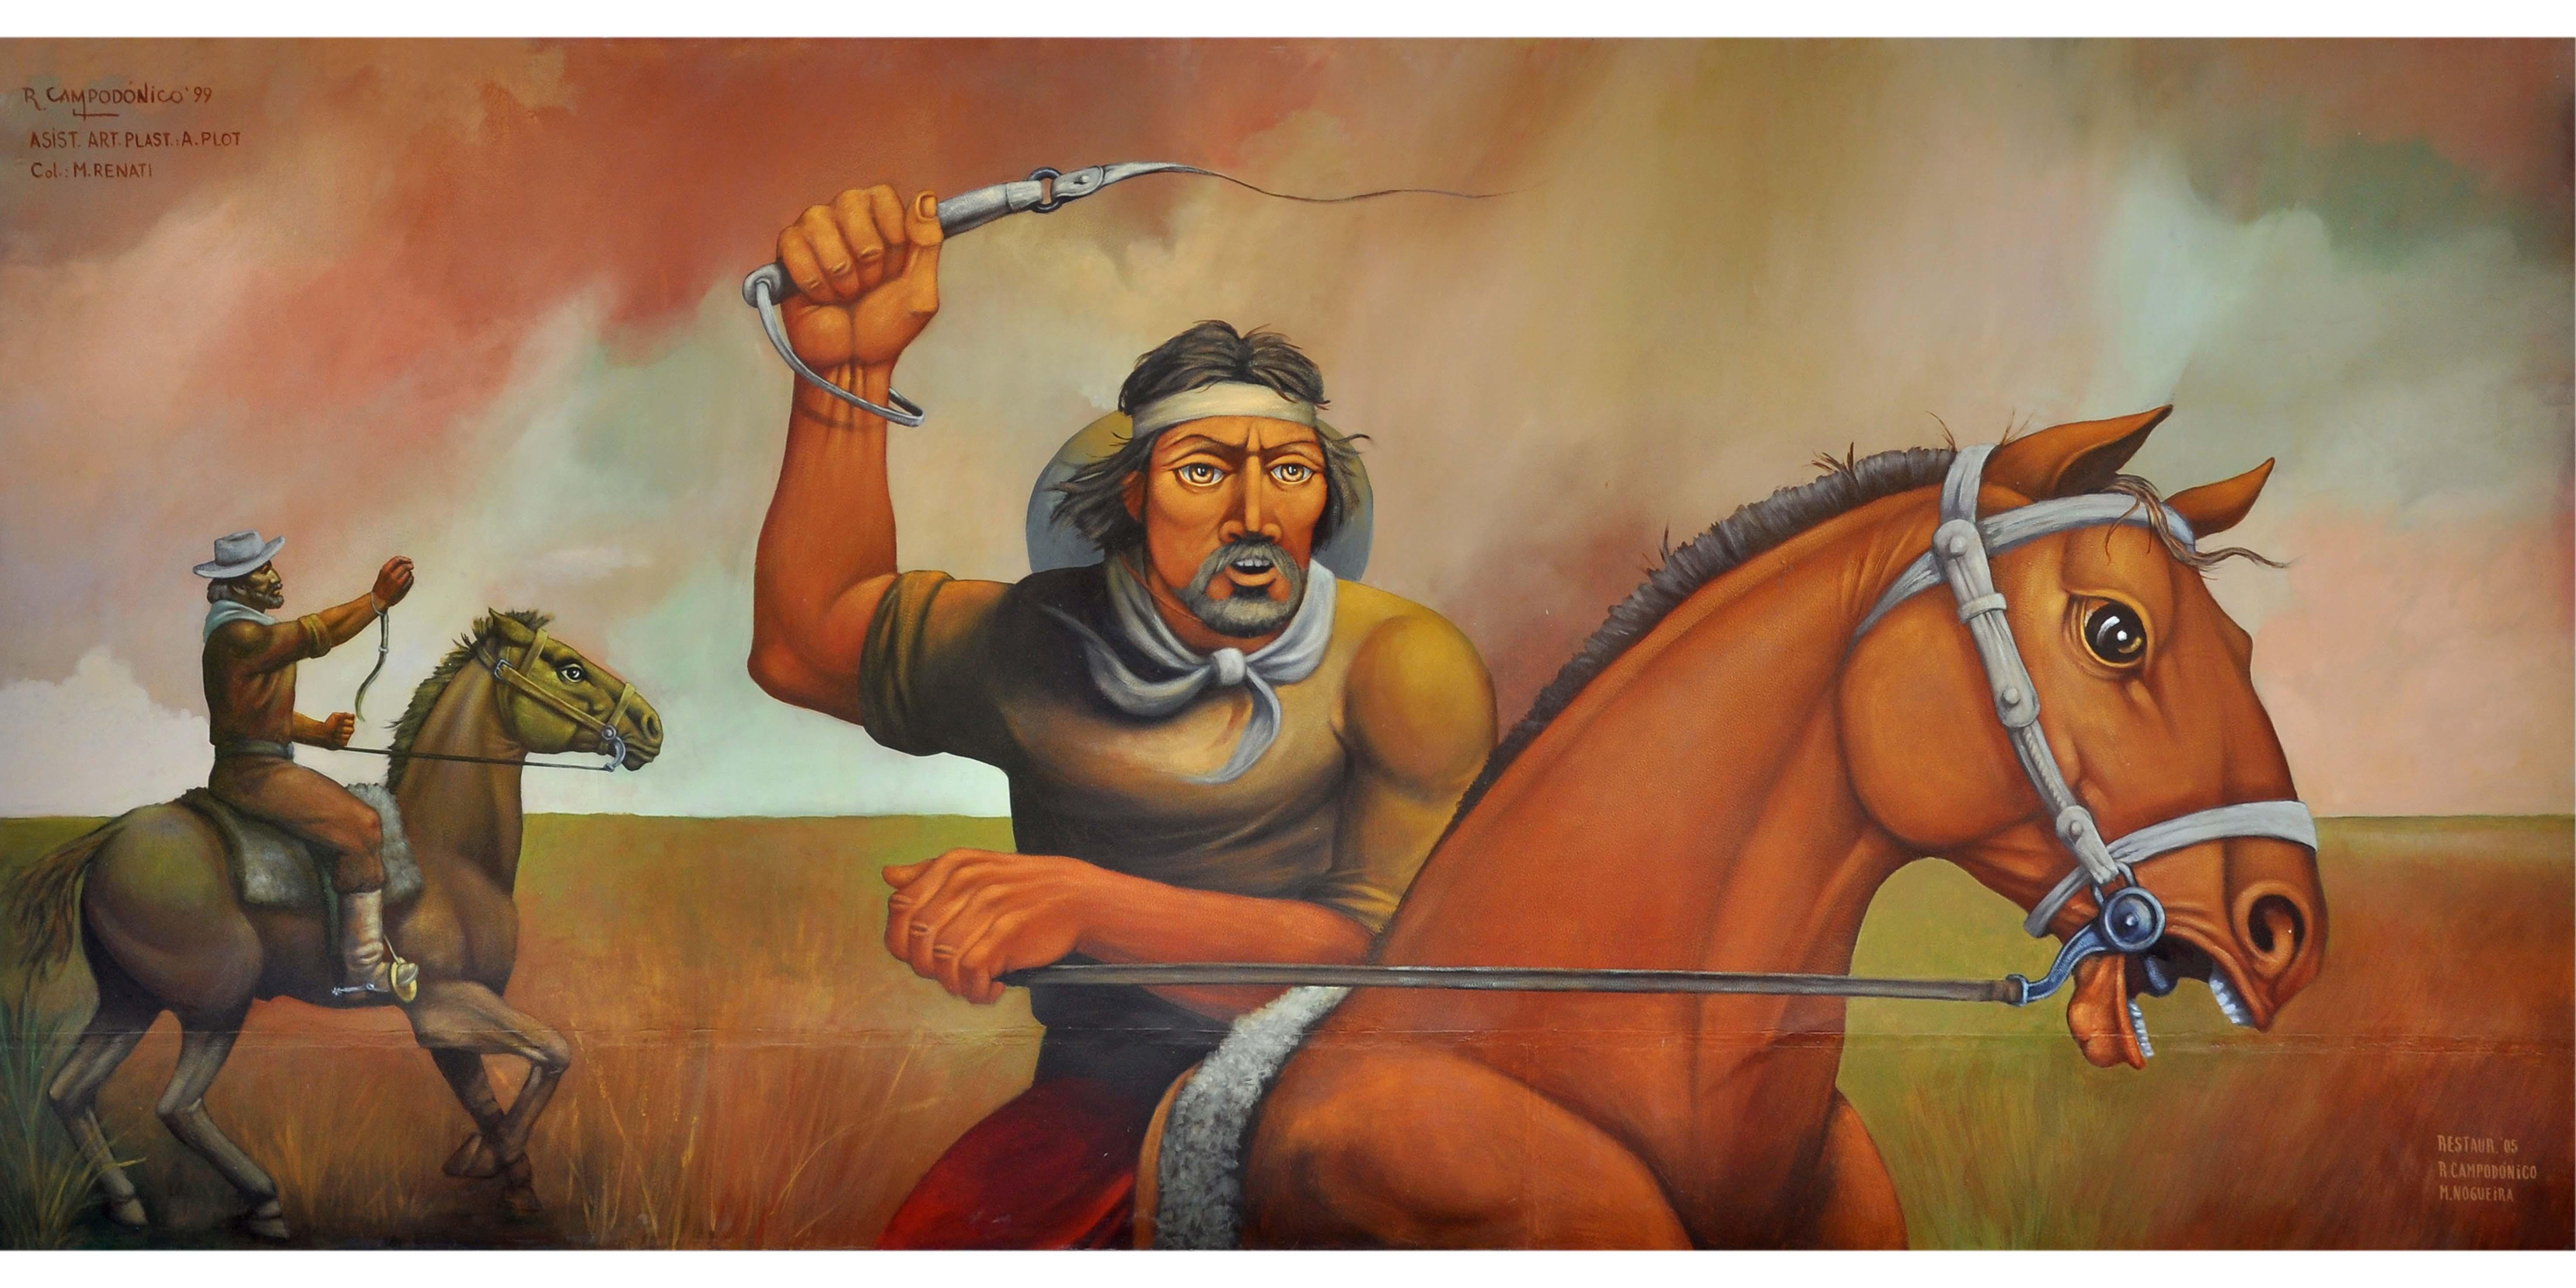 (26) Homenaje a Don Atahualpa Yupanqui